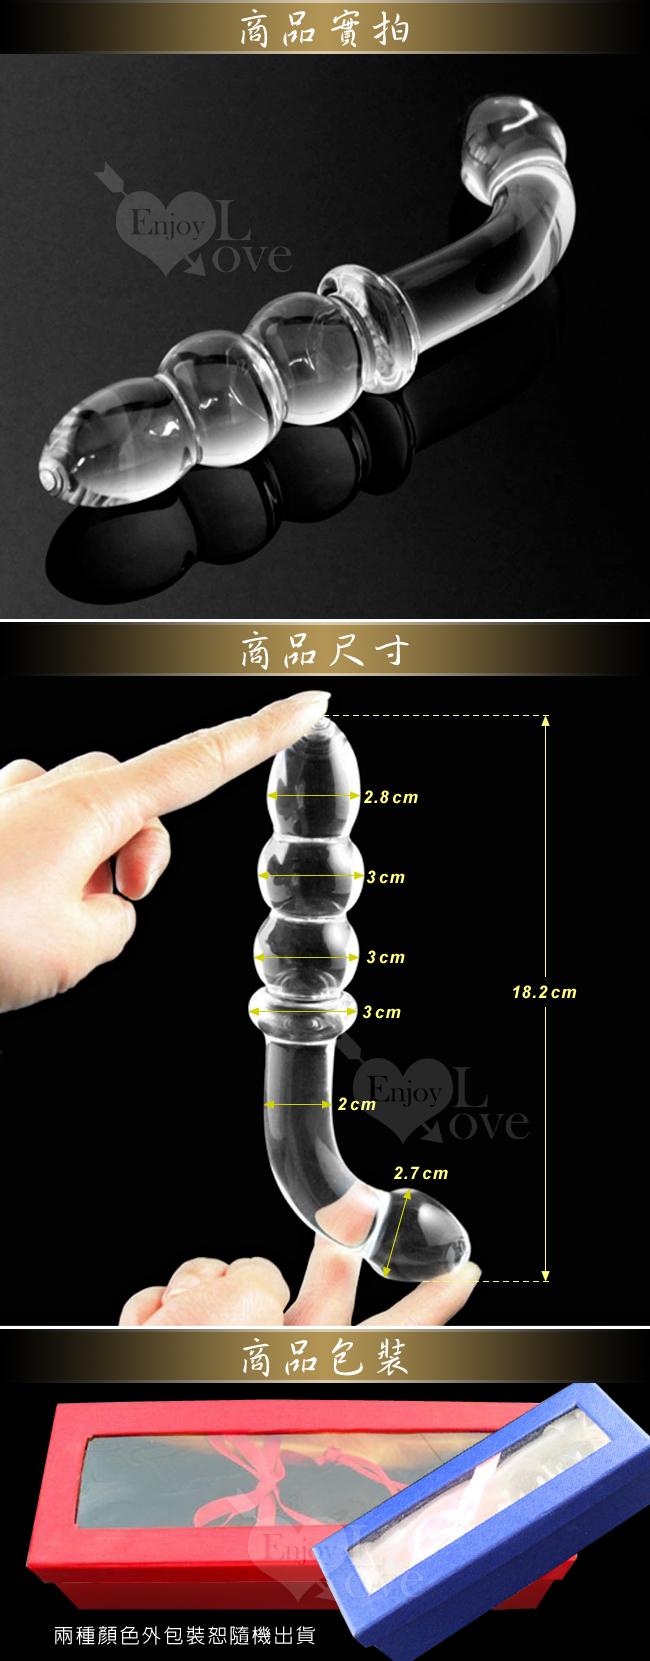 G點葫蘆棒‧橢圓頭連珠水晶玻璃棒﹝雙頭可用﹞-商品詳細圖-2